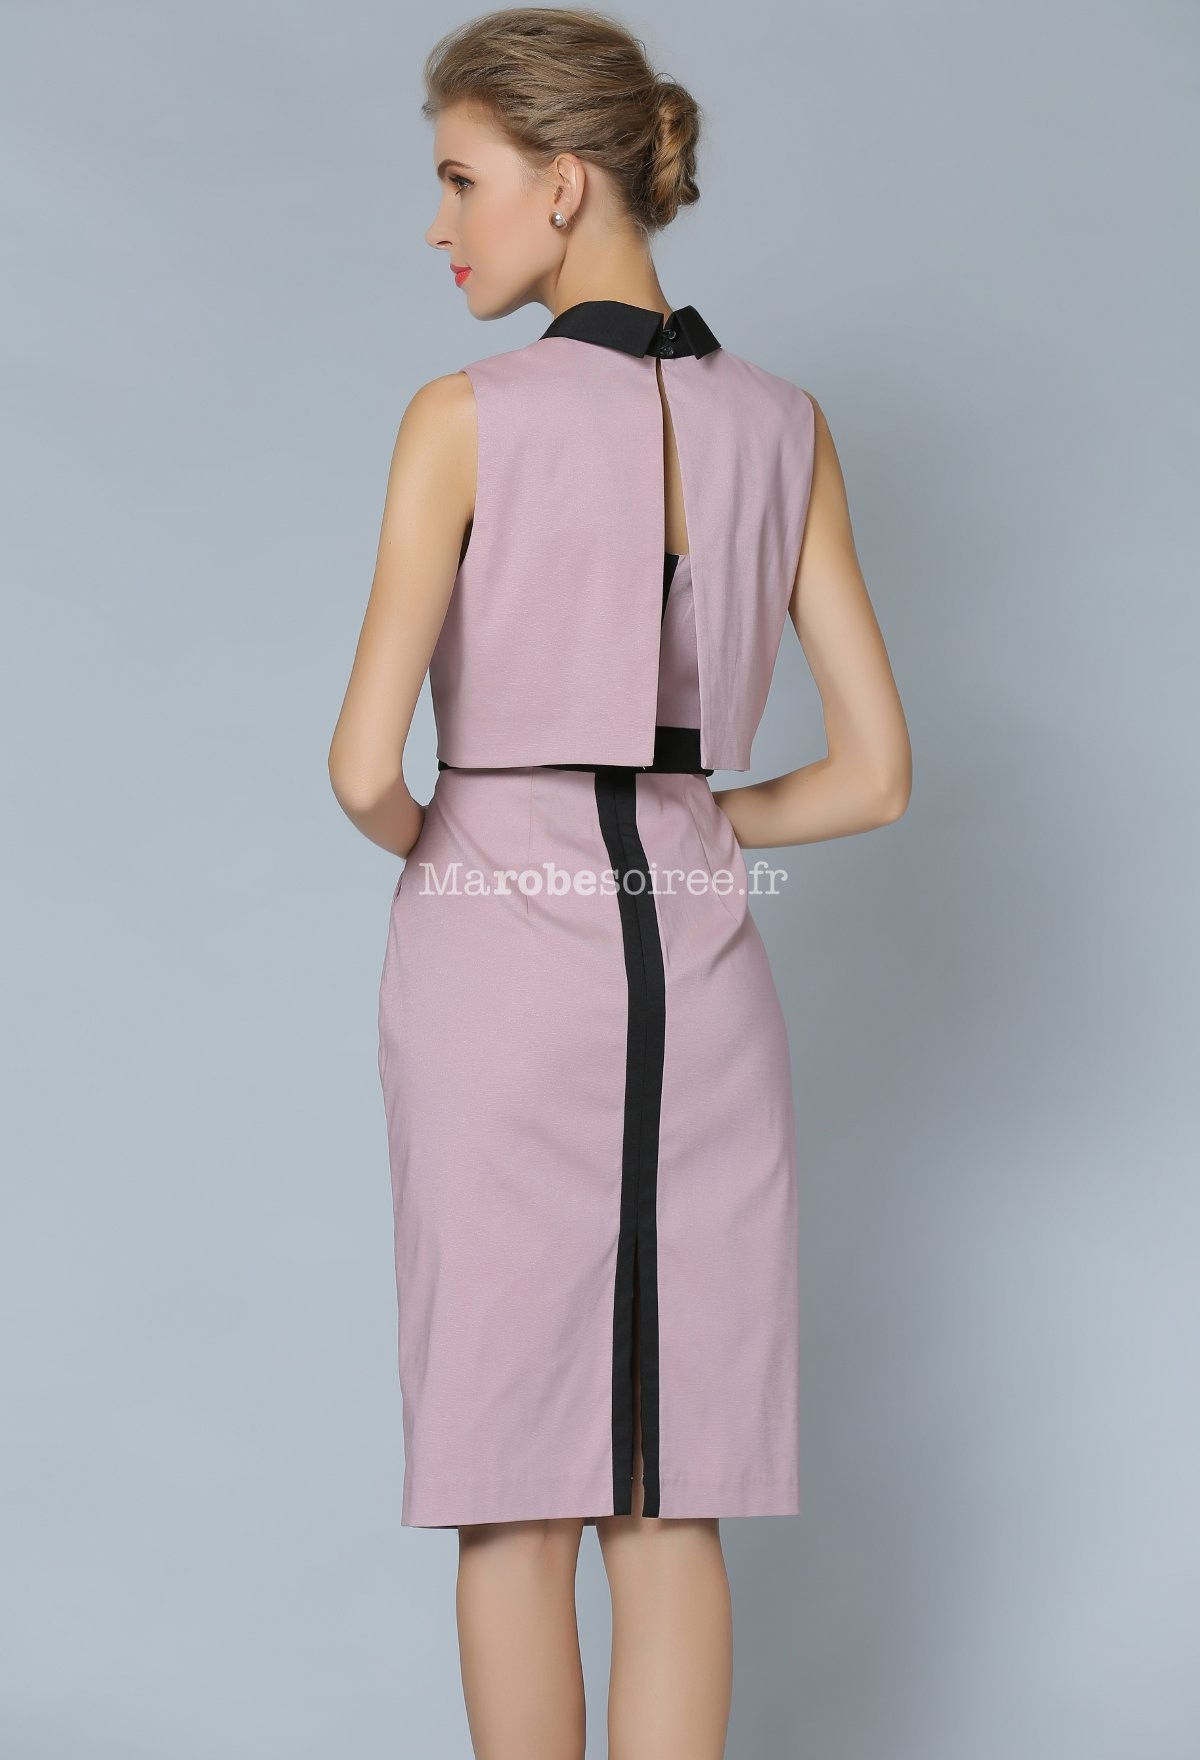 jolie robe tailleur rose poudr avec petite veste. Black Bedroom Furniture Sets. Home Design Ideas